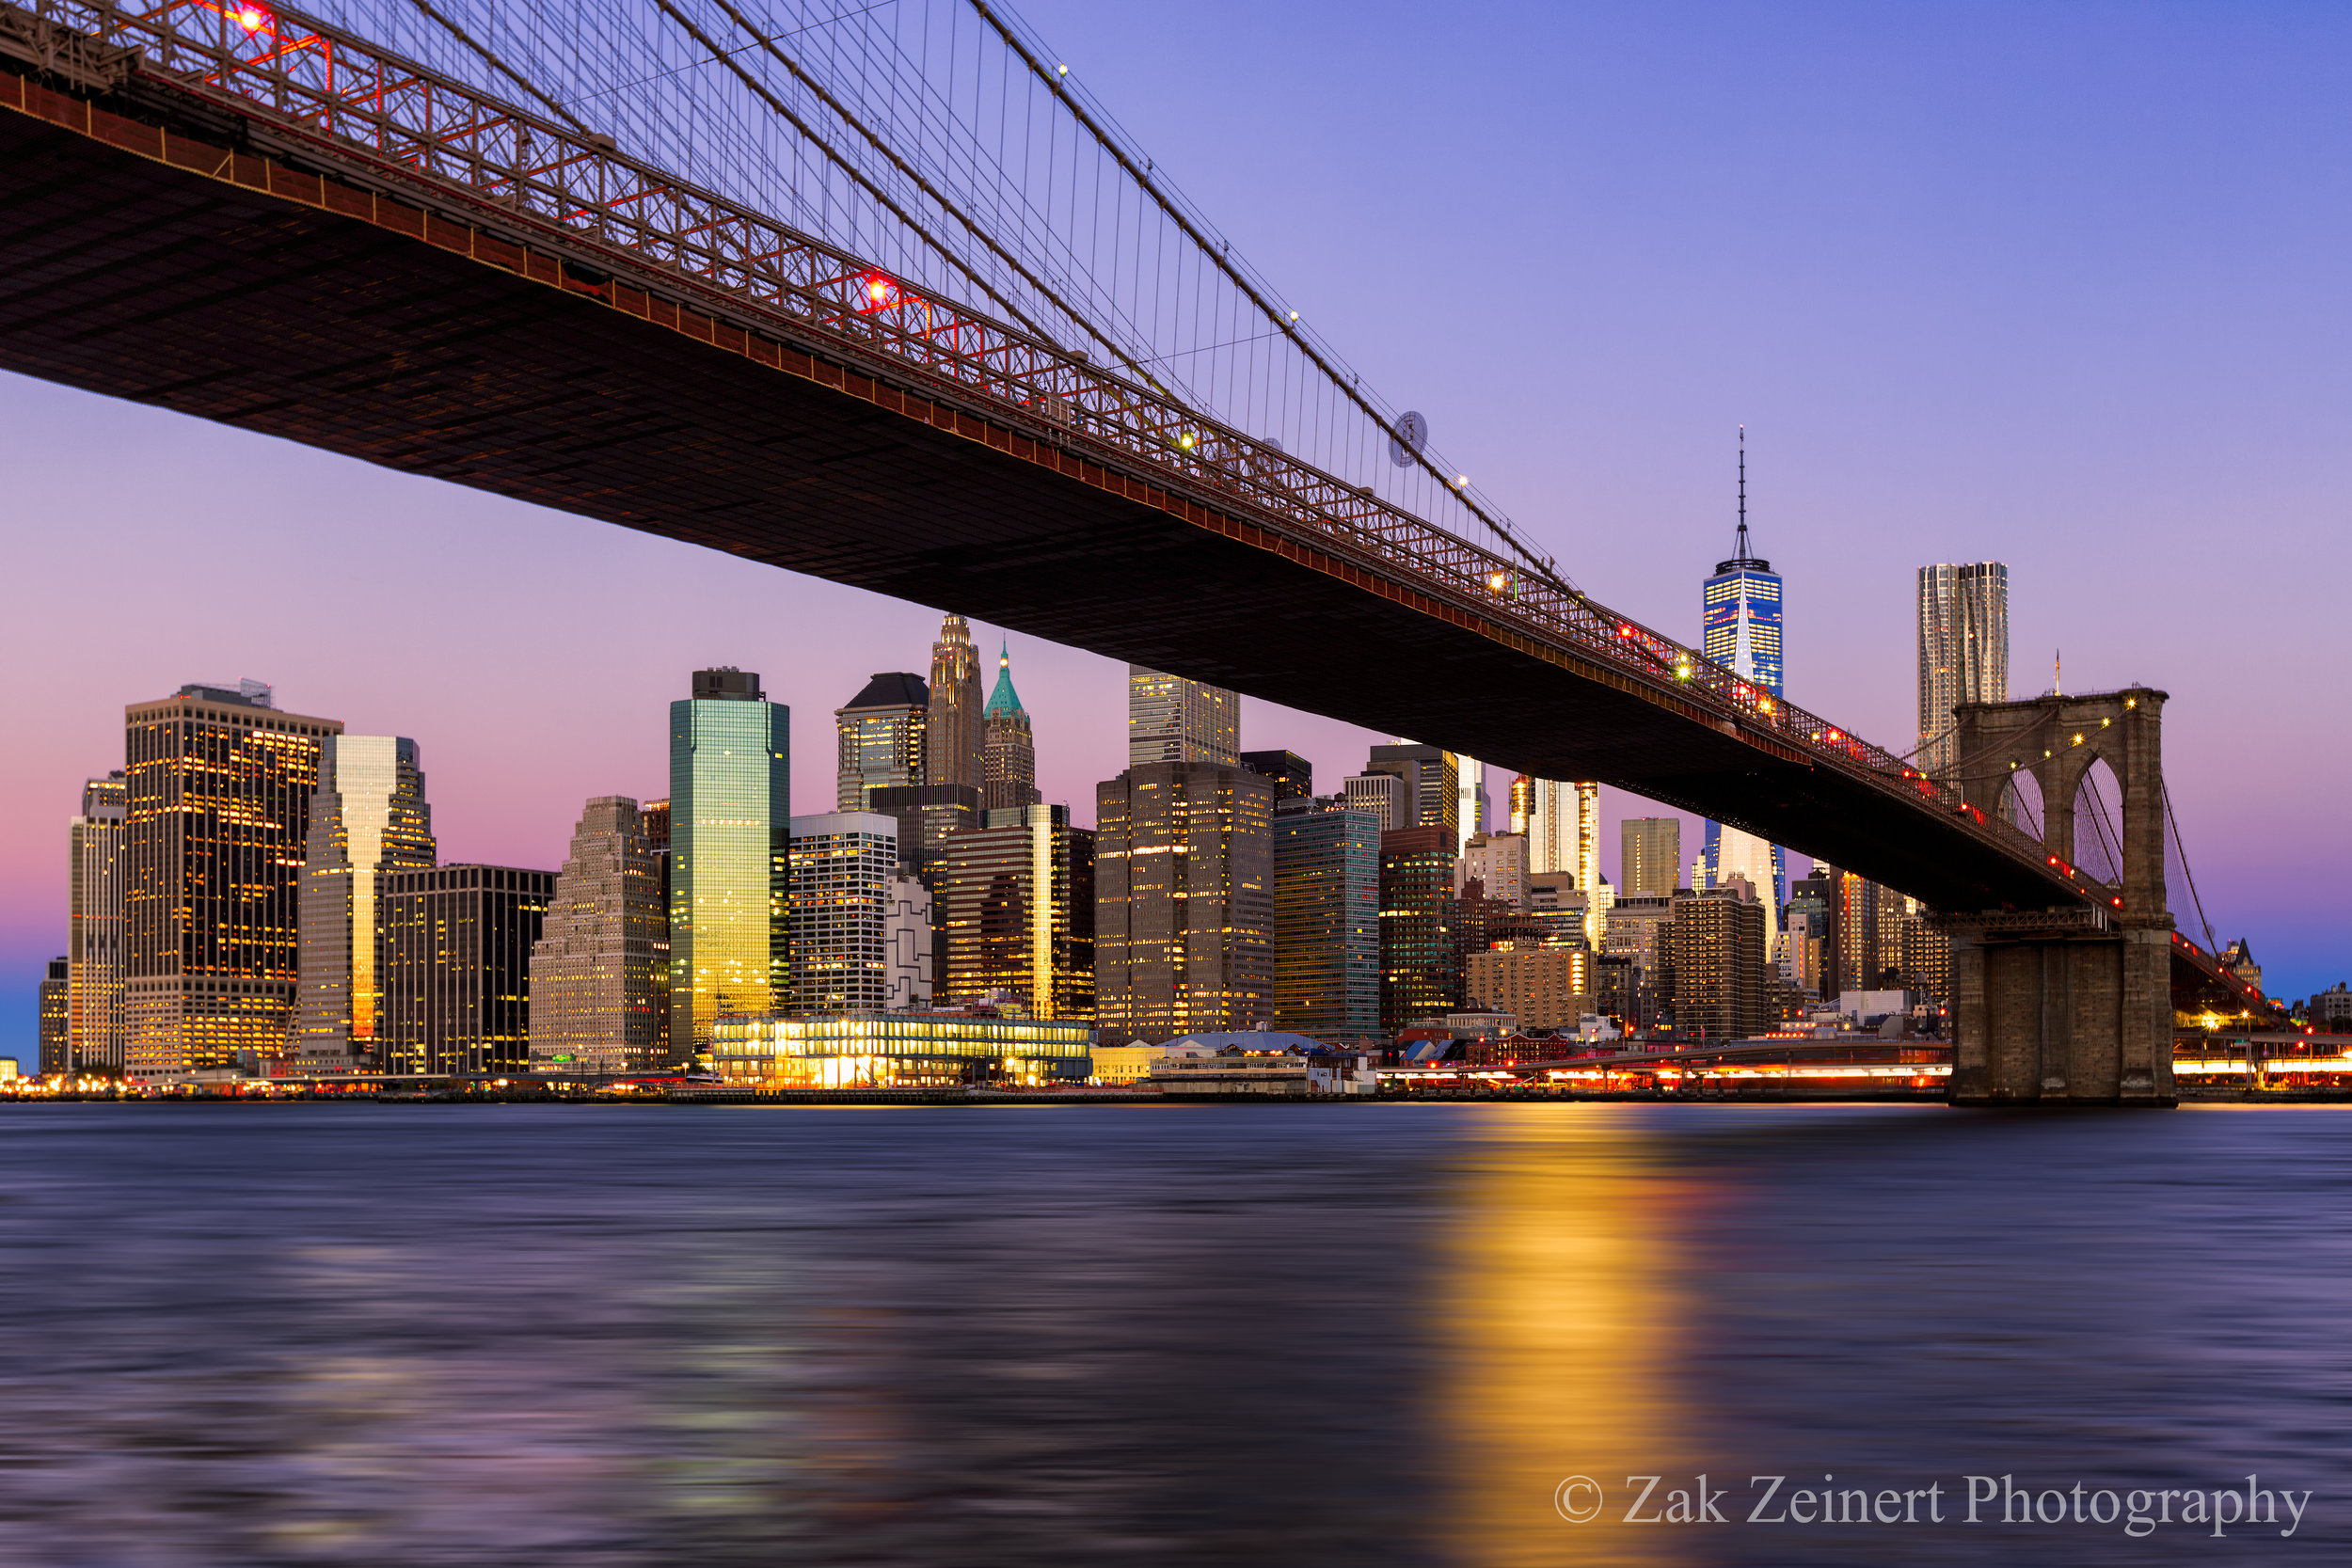 New York Skyline and the Brooklyn Bridge from Brooklyn Bridge Park